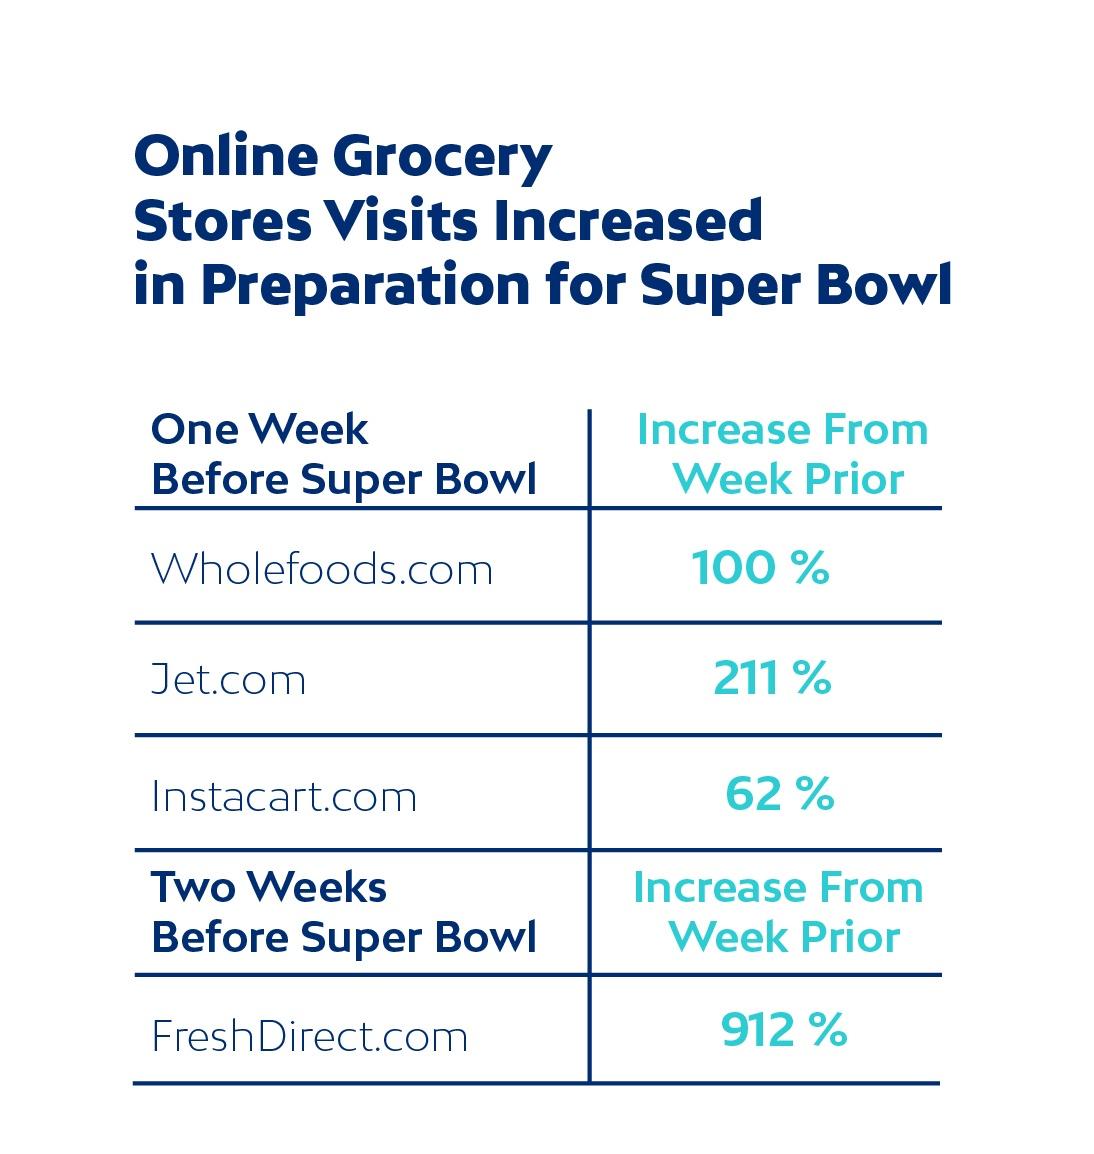 Super-bowl-online-grocery-increases.jpg